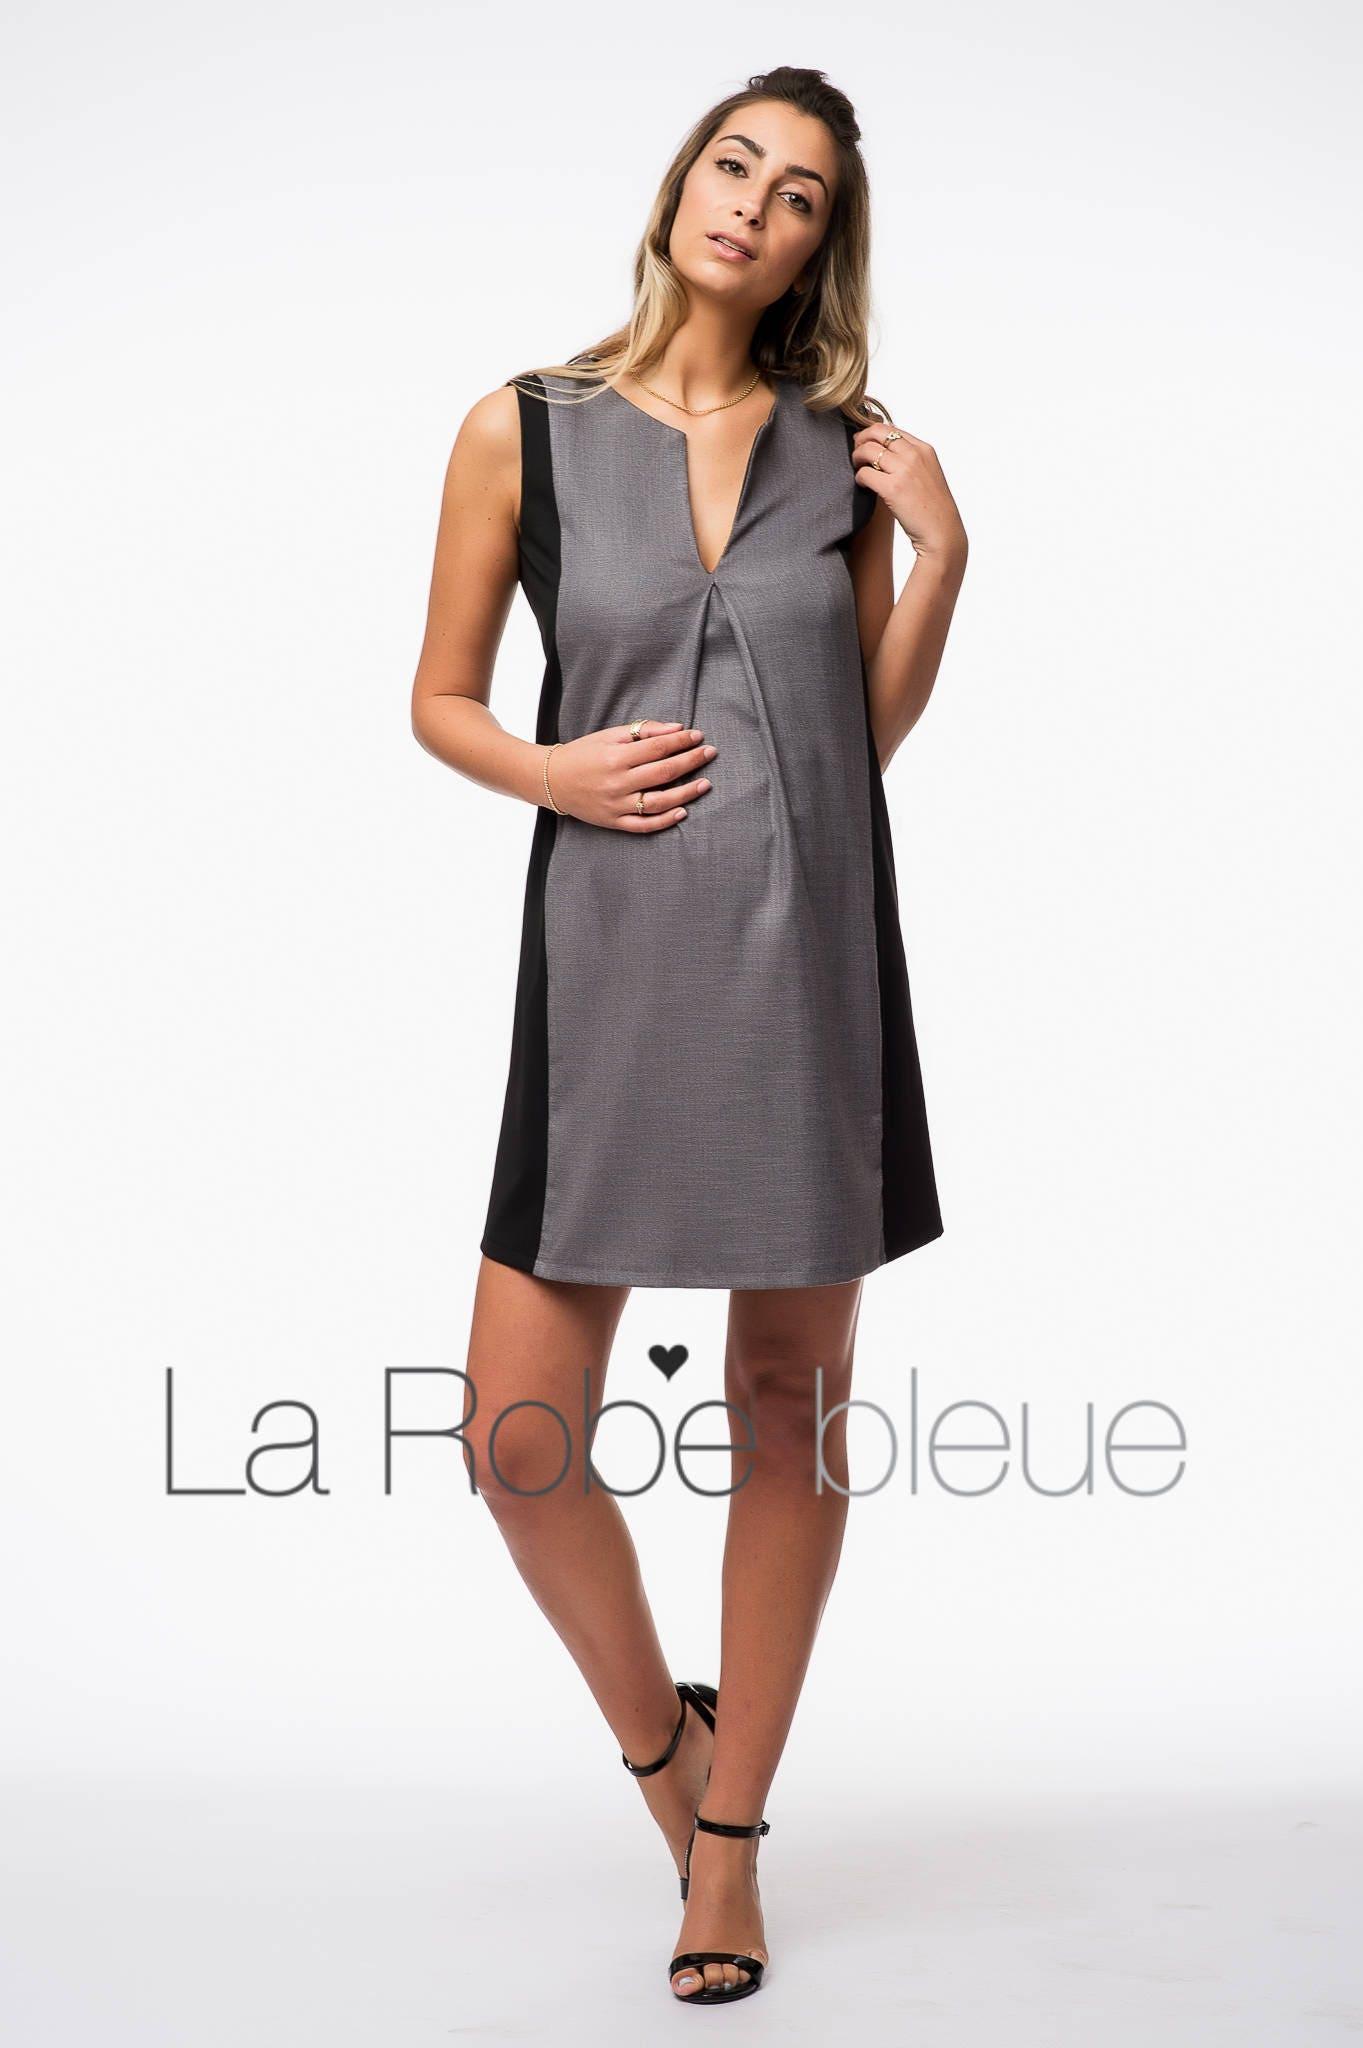 Colorblock maternity dress gray and black dress chic description a versatile colorblock maternity dress ombrellifo Gallery